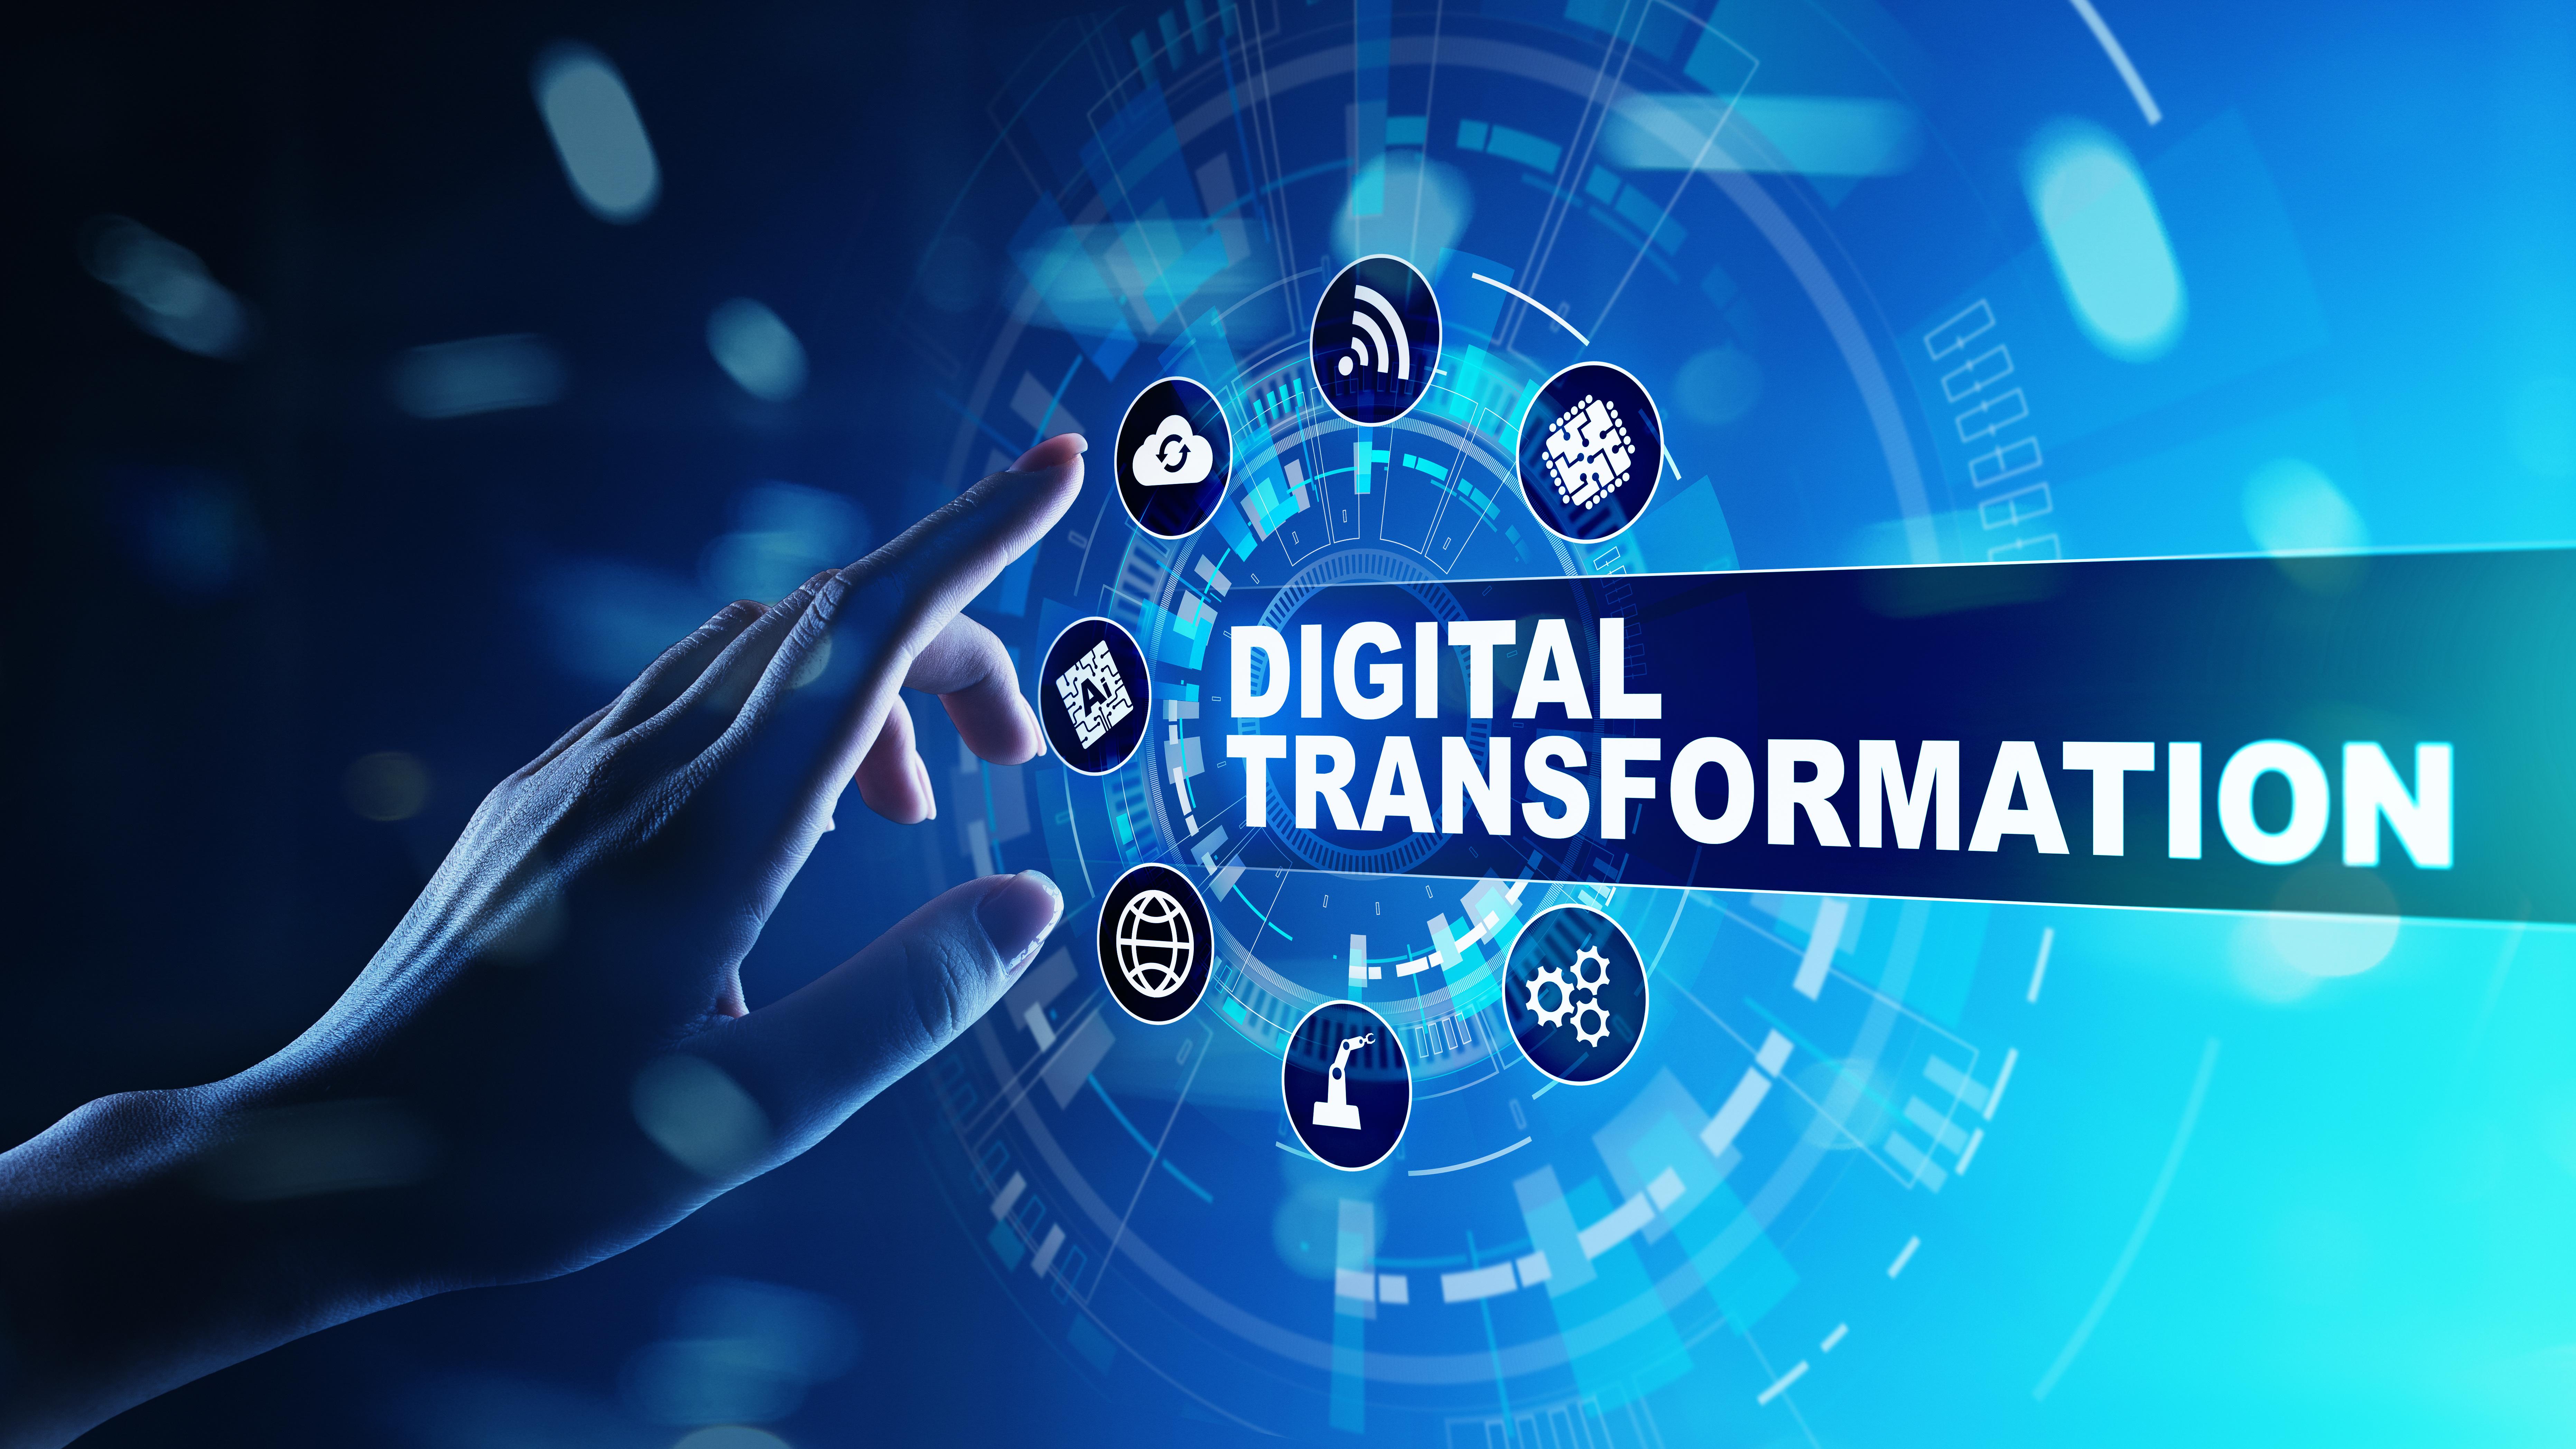 PLantStar 4.0 MES helps manufacturers achieve digitial transformation